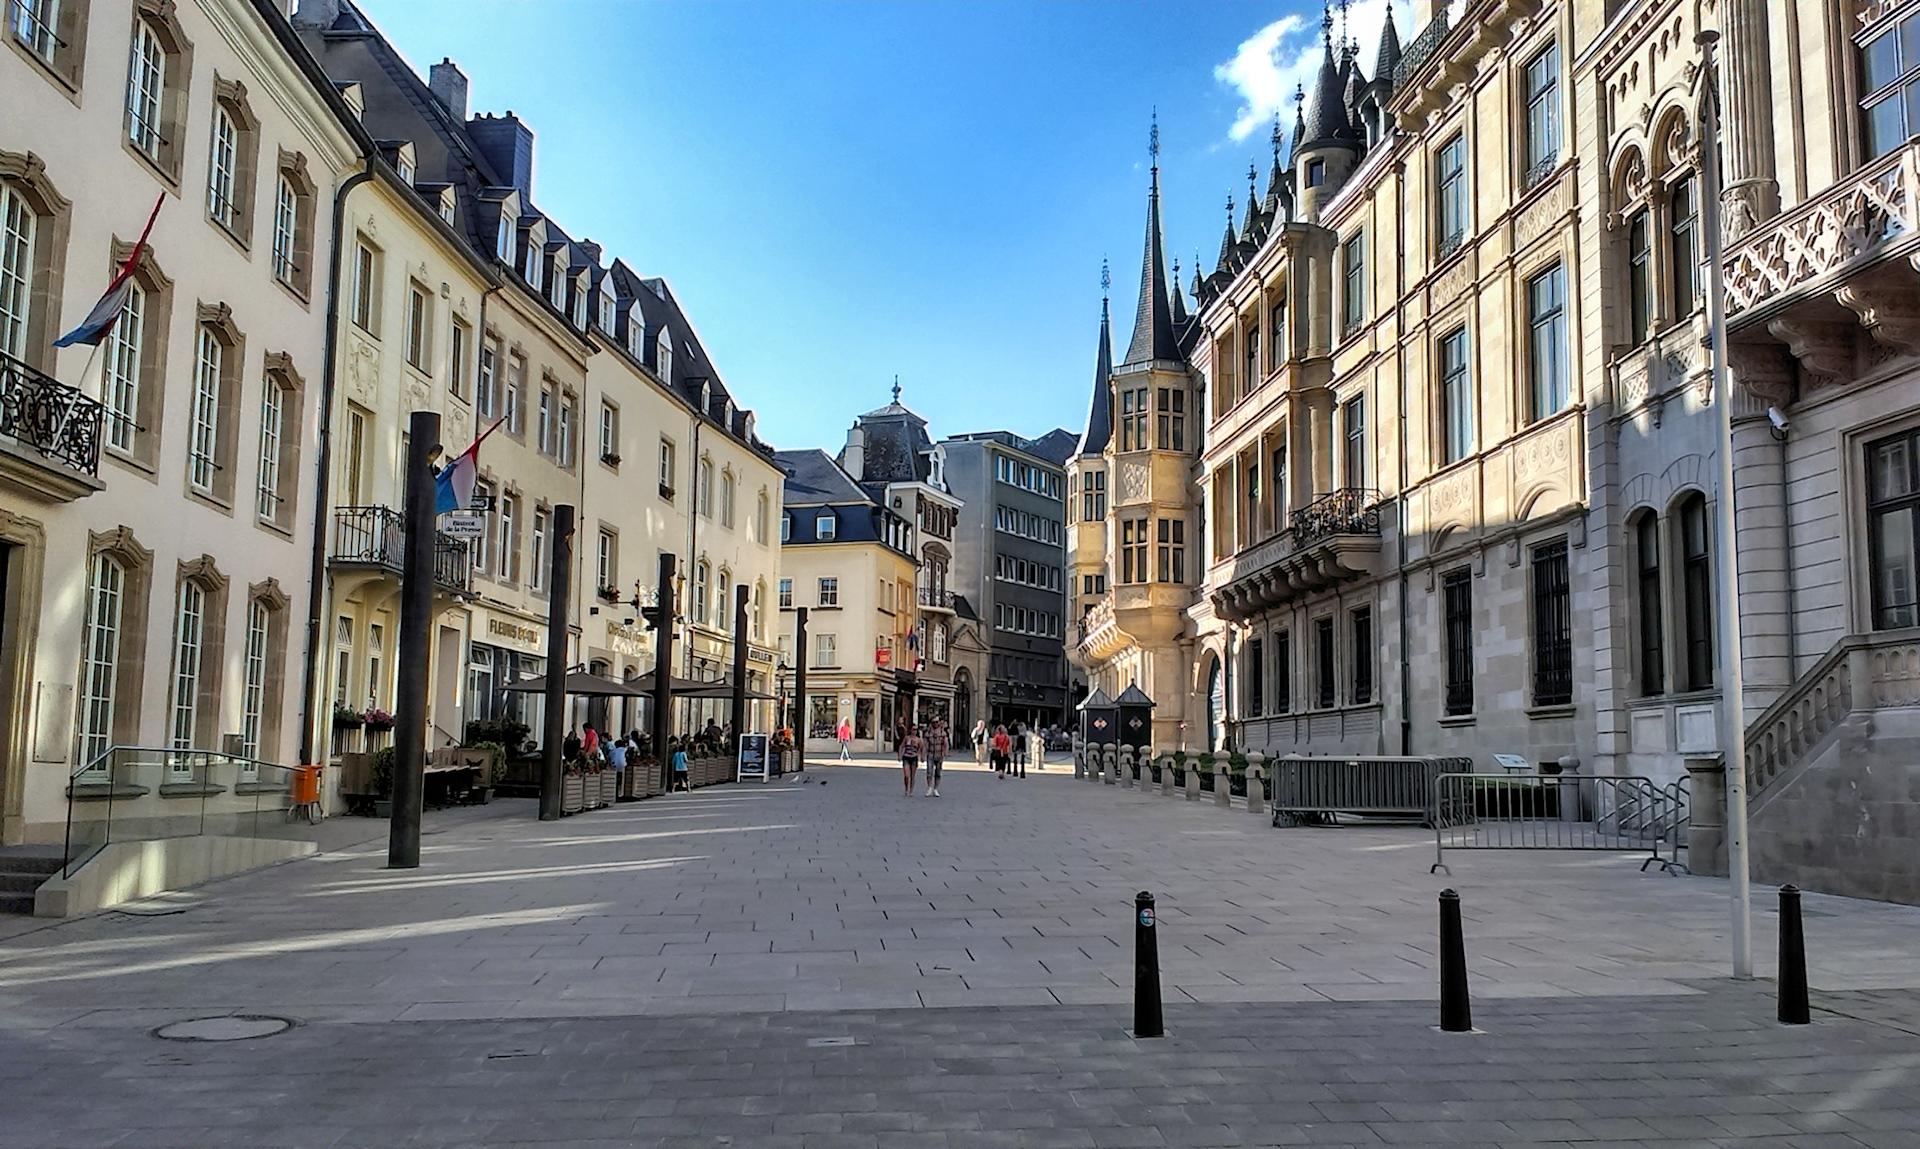 Restaurant Centre Ville De Troyes Specialit Ef Bf Bdes Locales